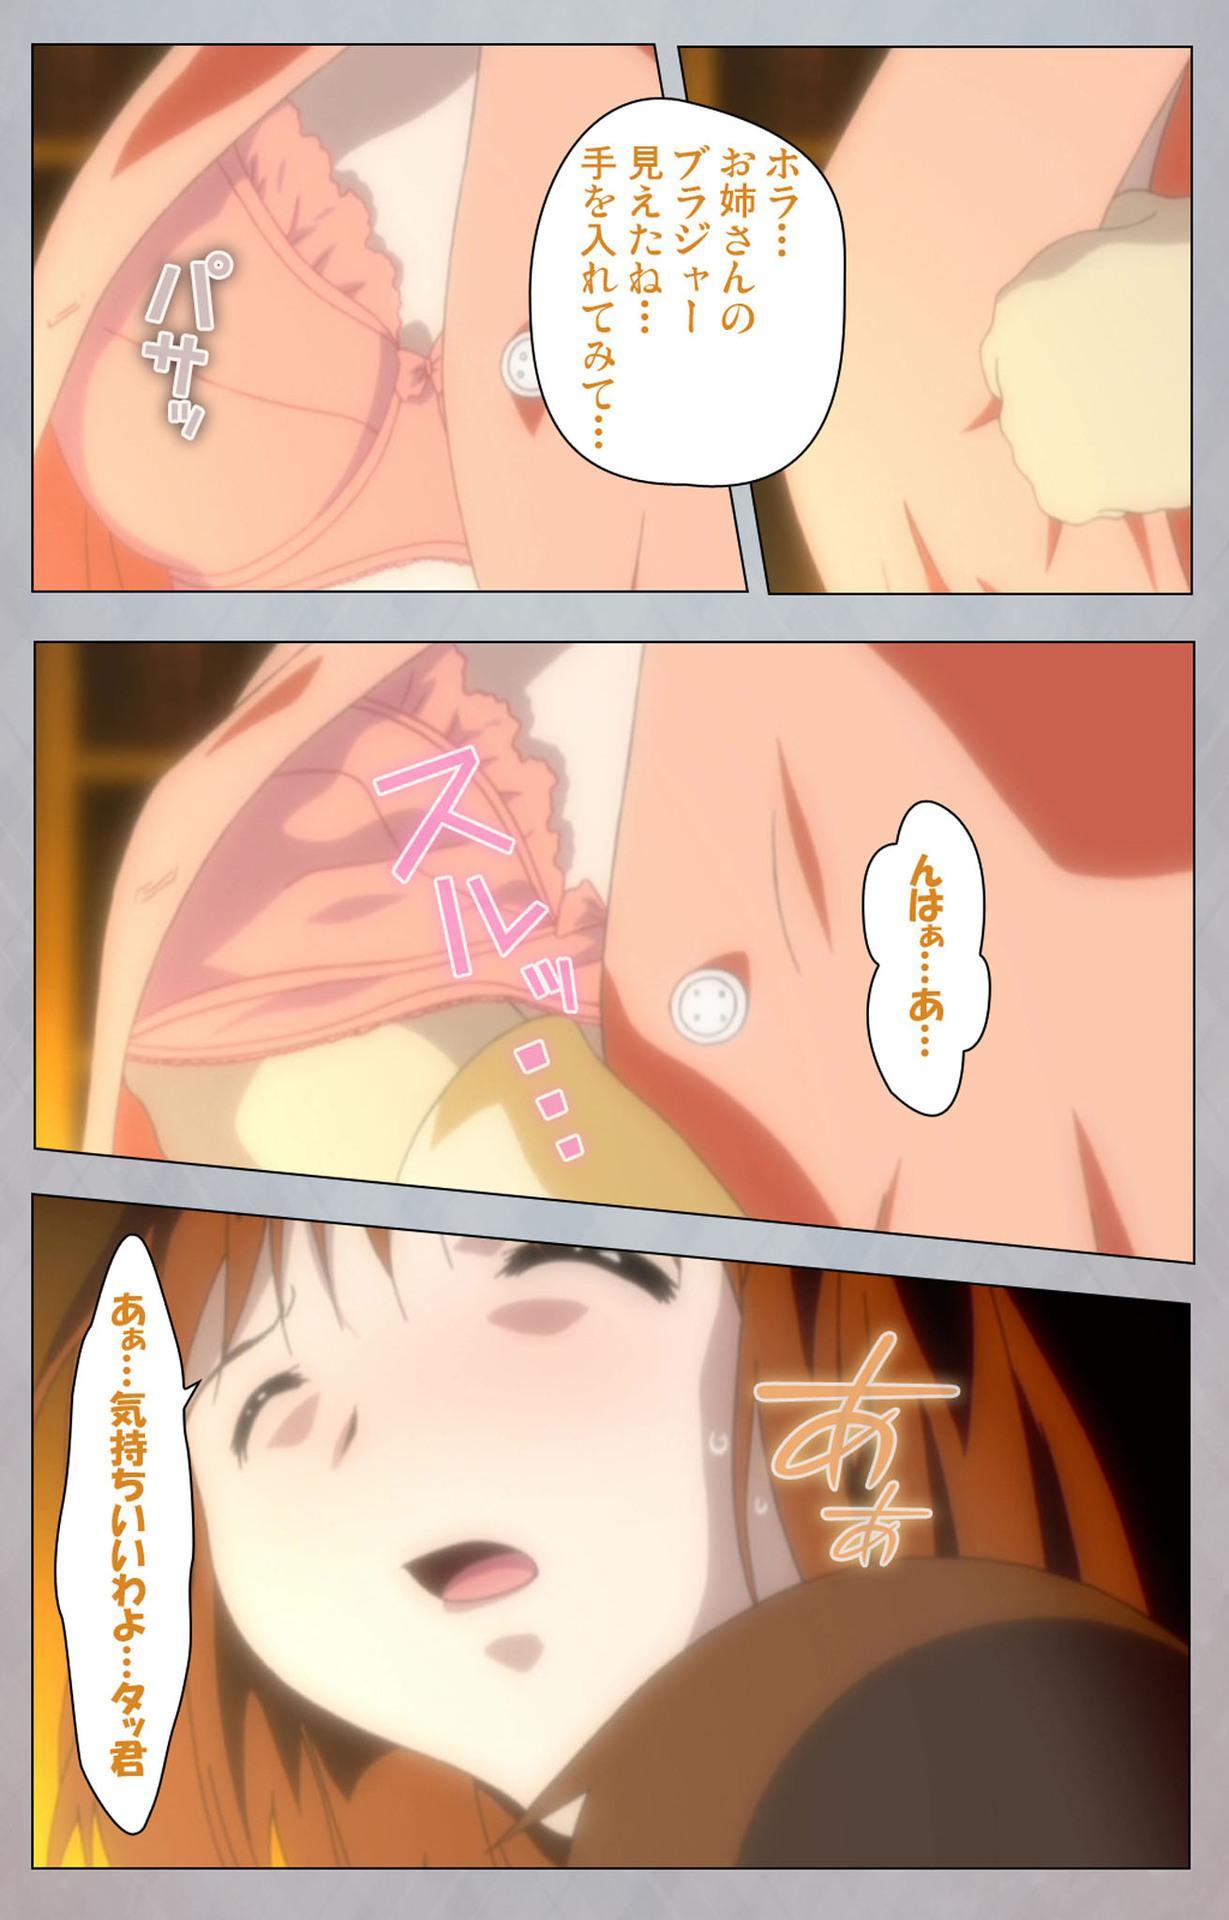 [Digital Works] [Full Color Seijin Ban] Sex Android ~Risou no Onna de Nuite yaru~ Kanzenban 79